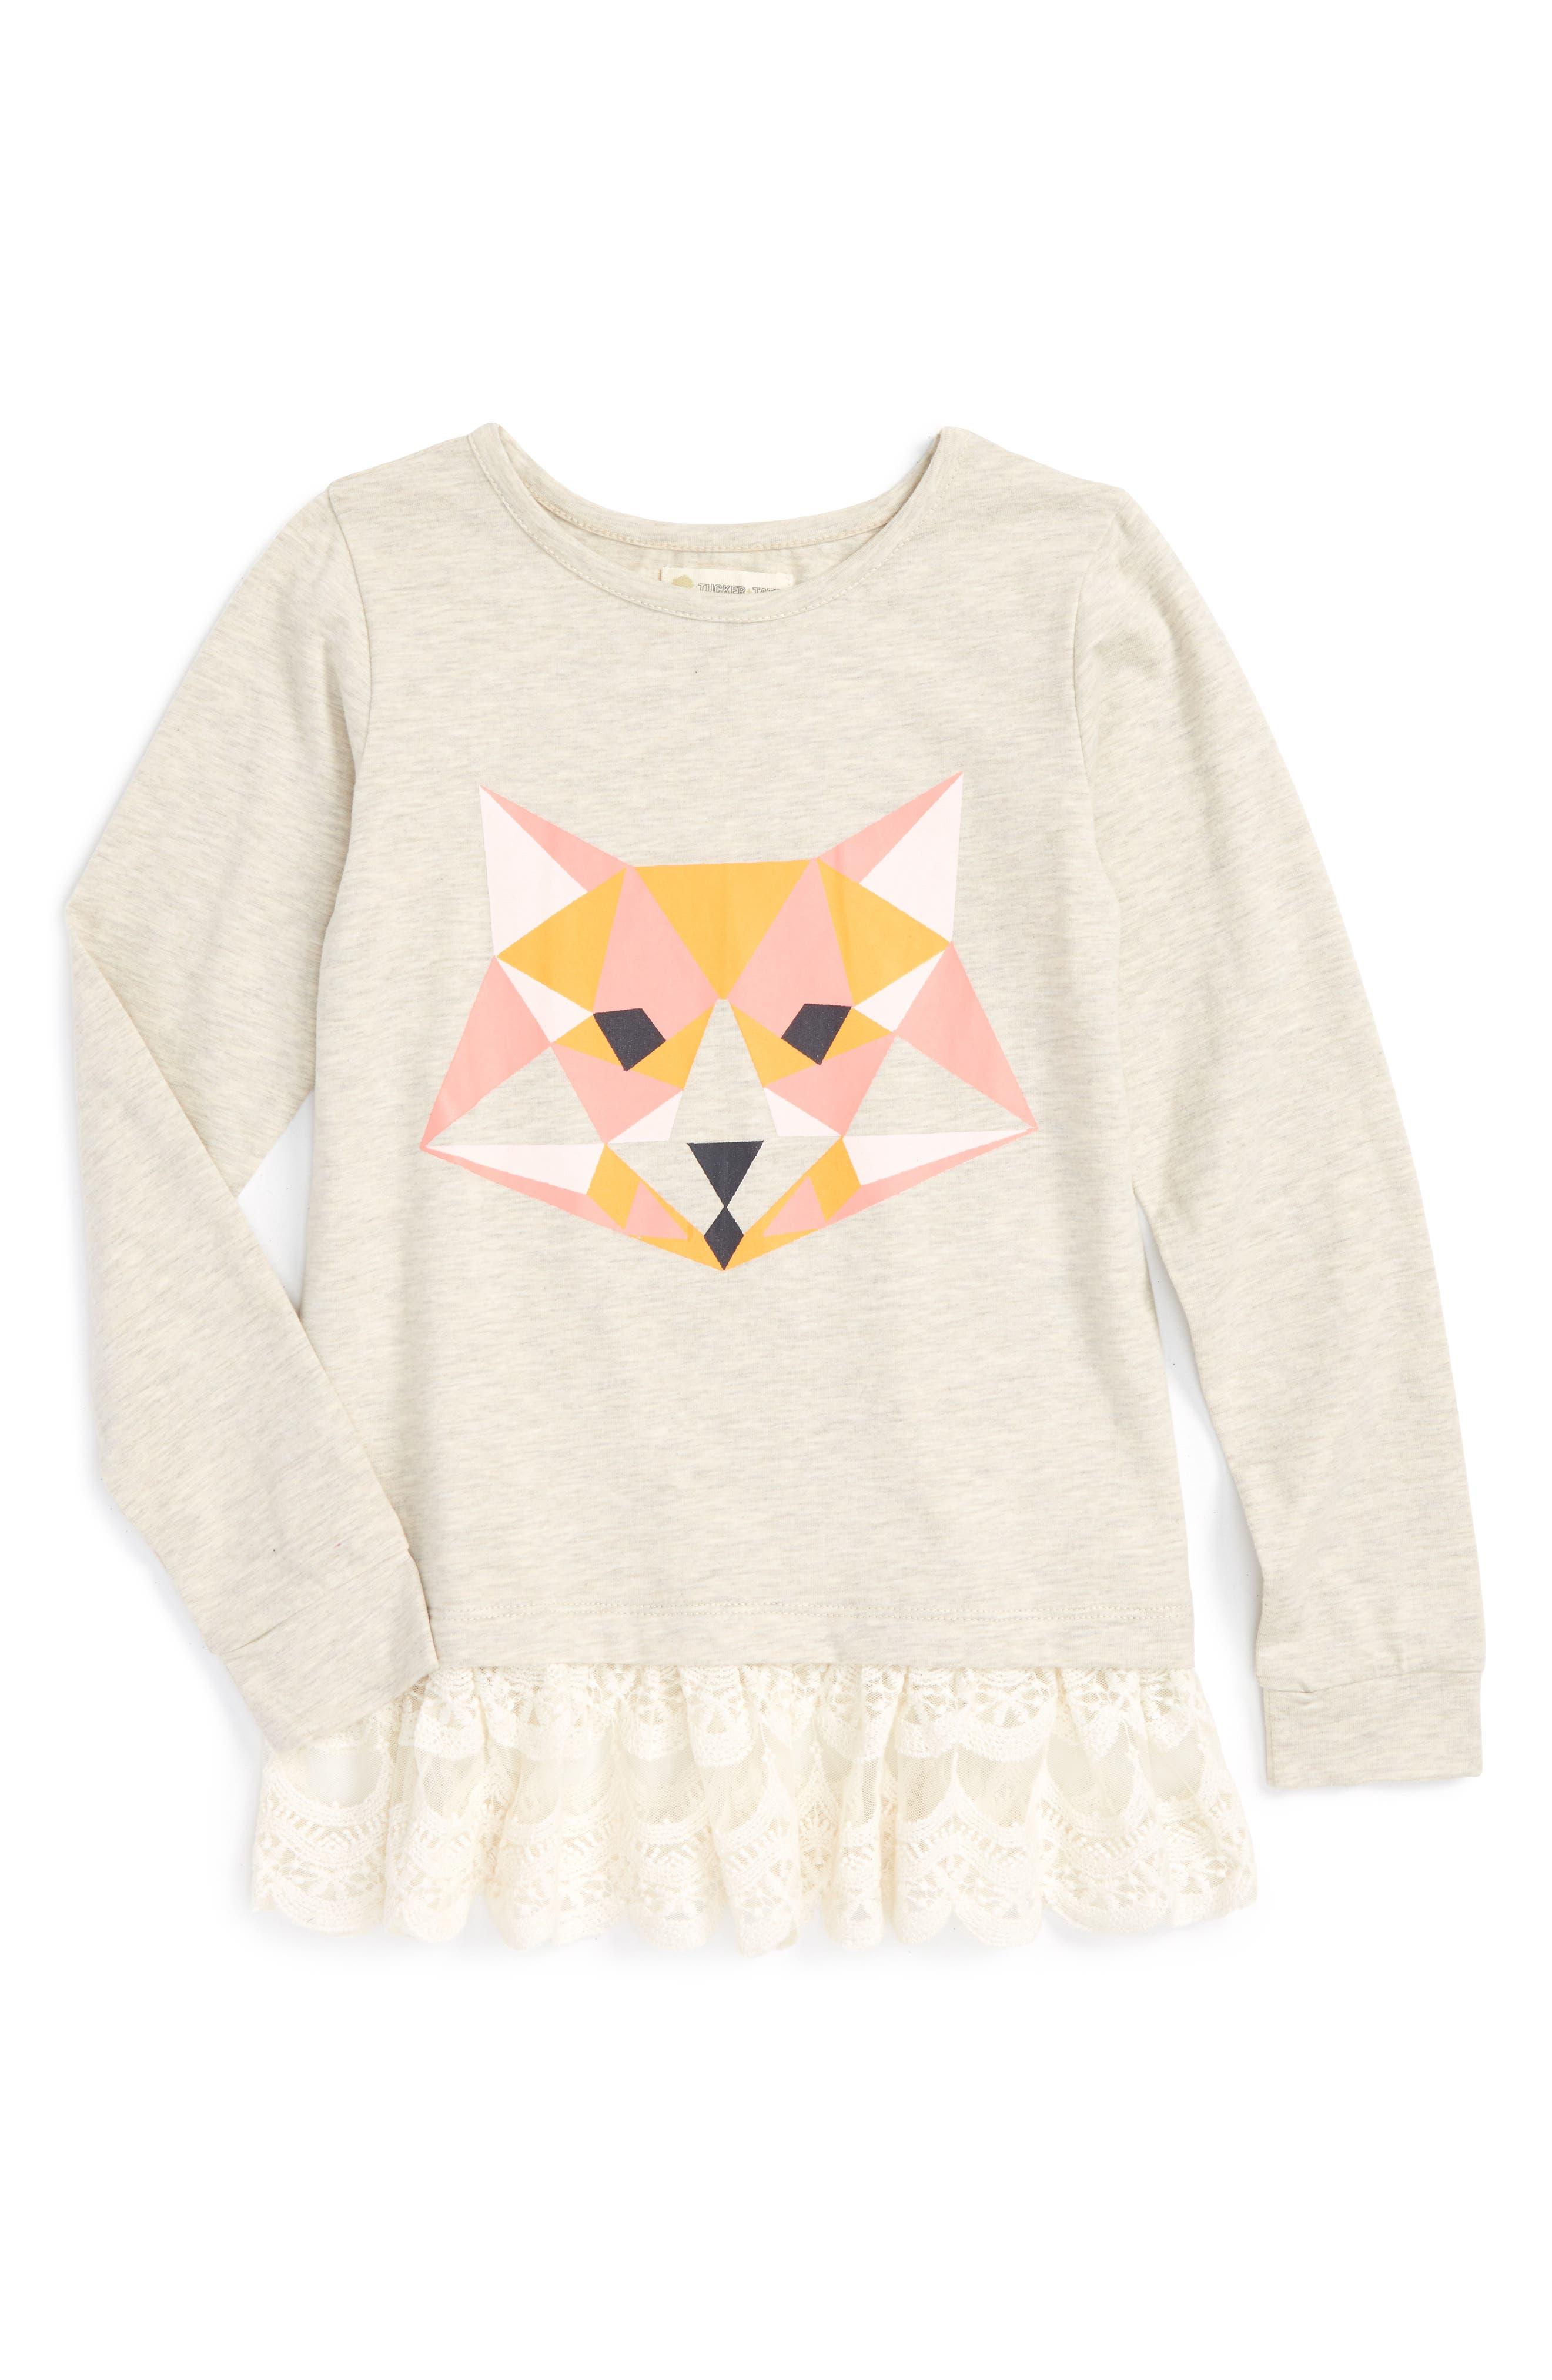 Main Image - Tucker + Tate 'Britton' Graphic Lace Hem Tunic (Toddler Girls, Little Girls & Big Girls)